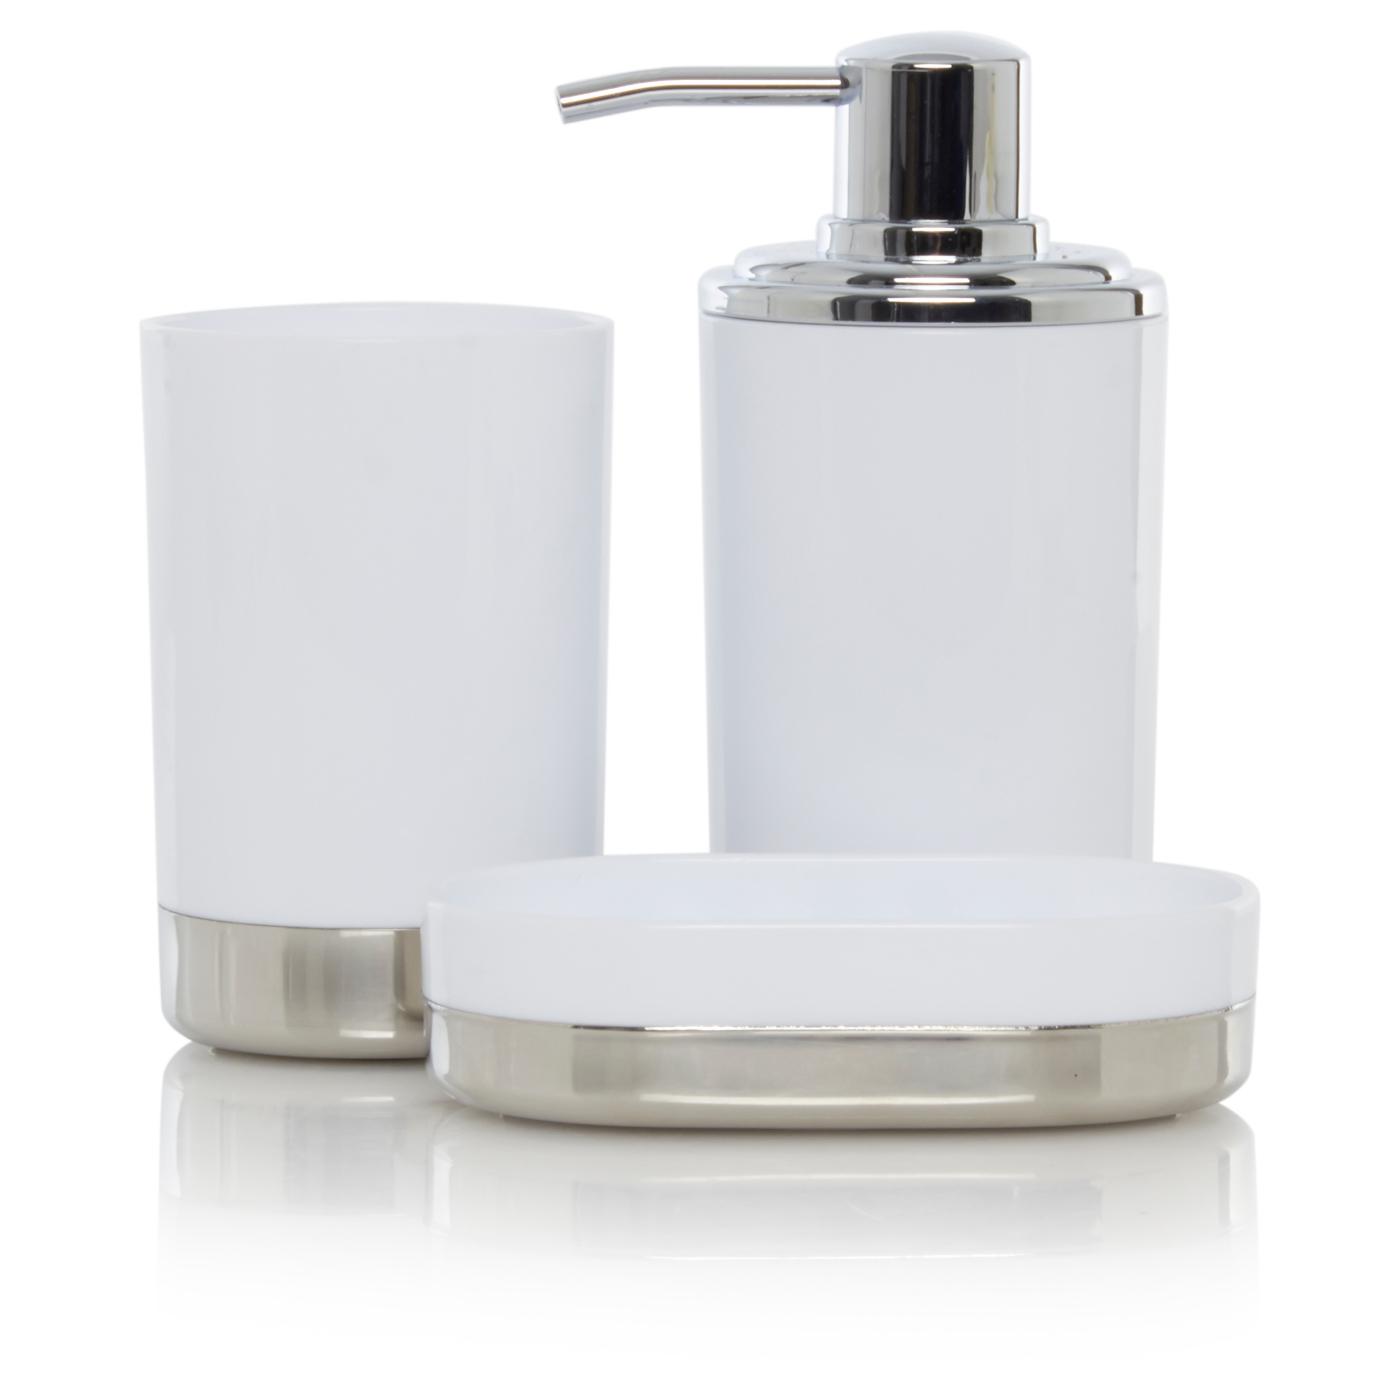 george home white  chrome bath accessories range  bathroom, Bathroom decor